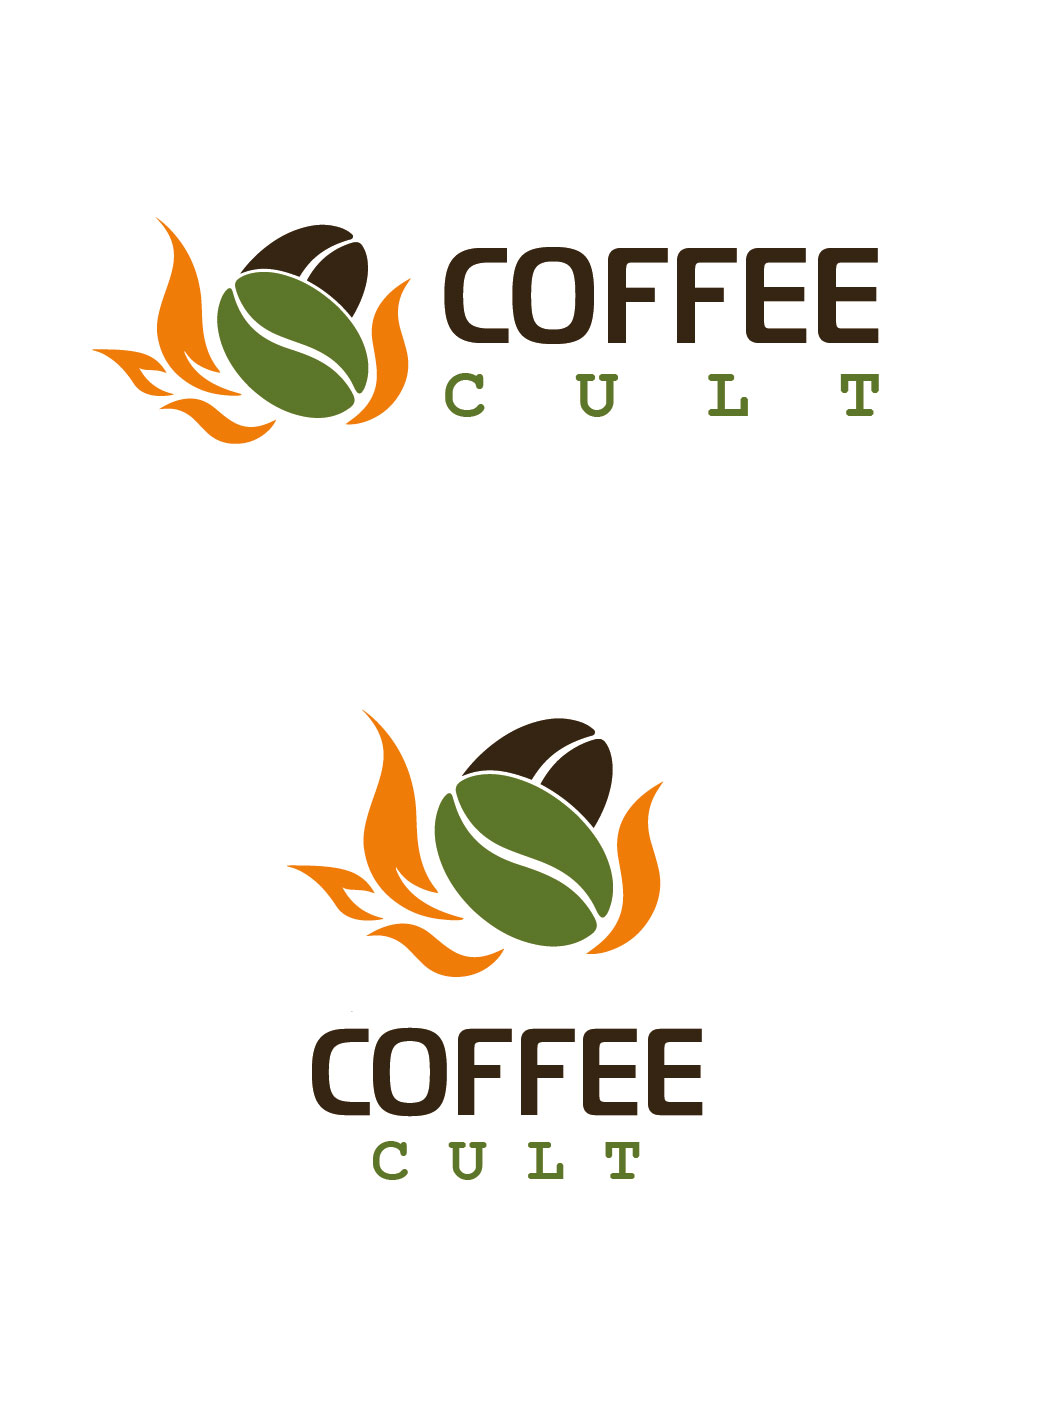 Логотип и фирменный стиль для компании COFFEE CULT фото f_0975bc22fbe125cf.jpg